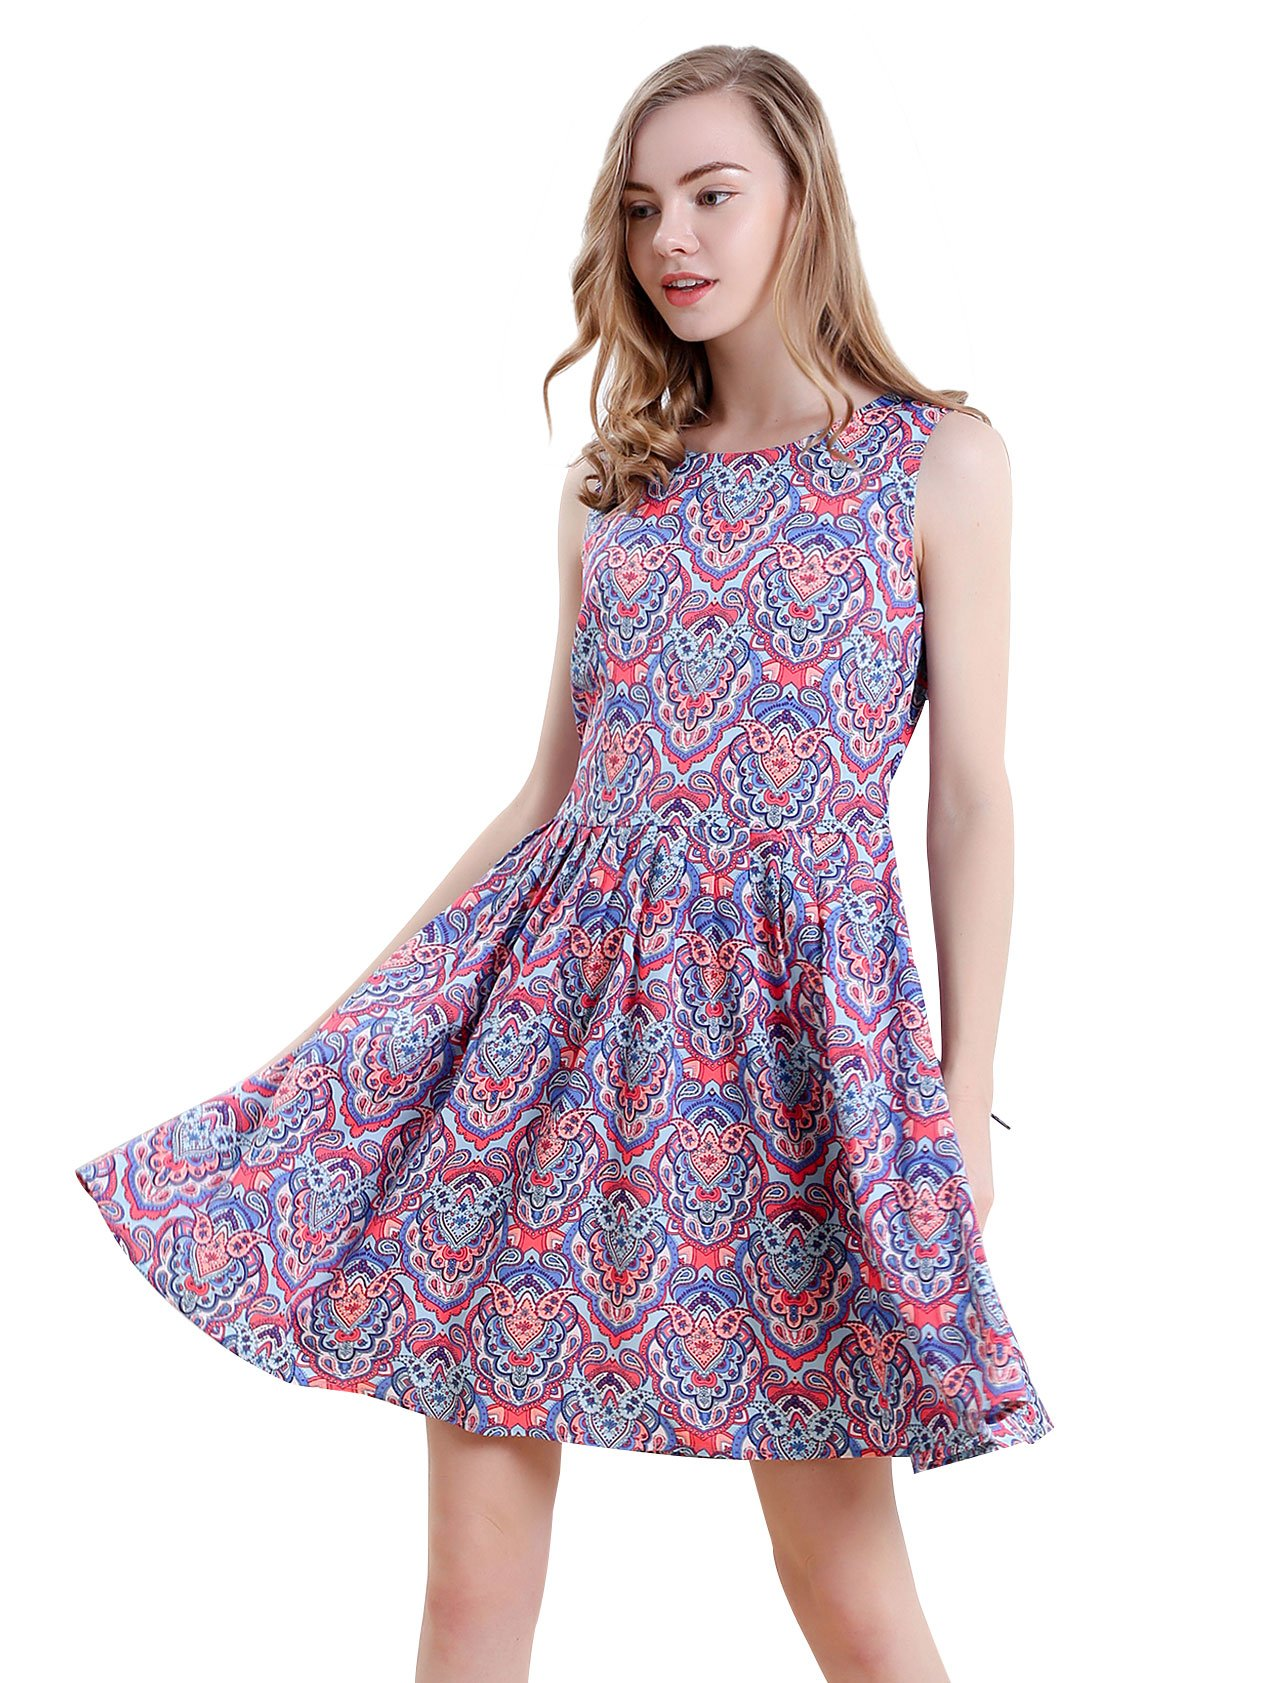 Vero Viva Women's Printed Sleeveless Summer Beach Midi A Line Tank Dress with Belt S